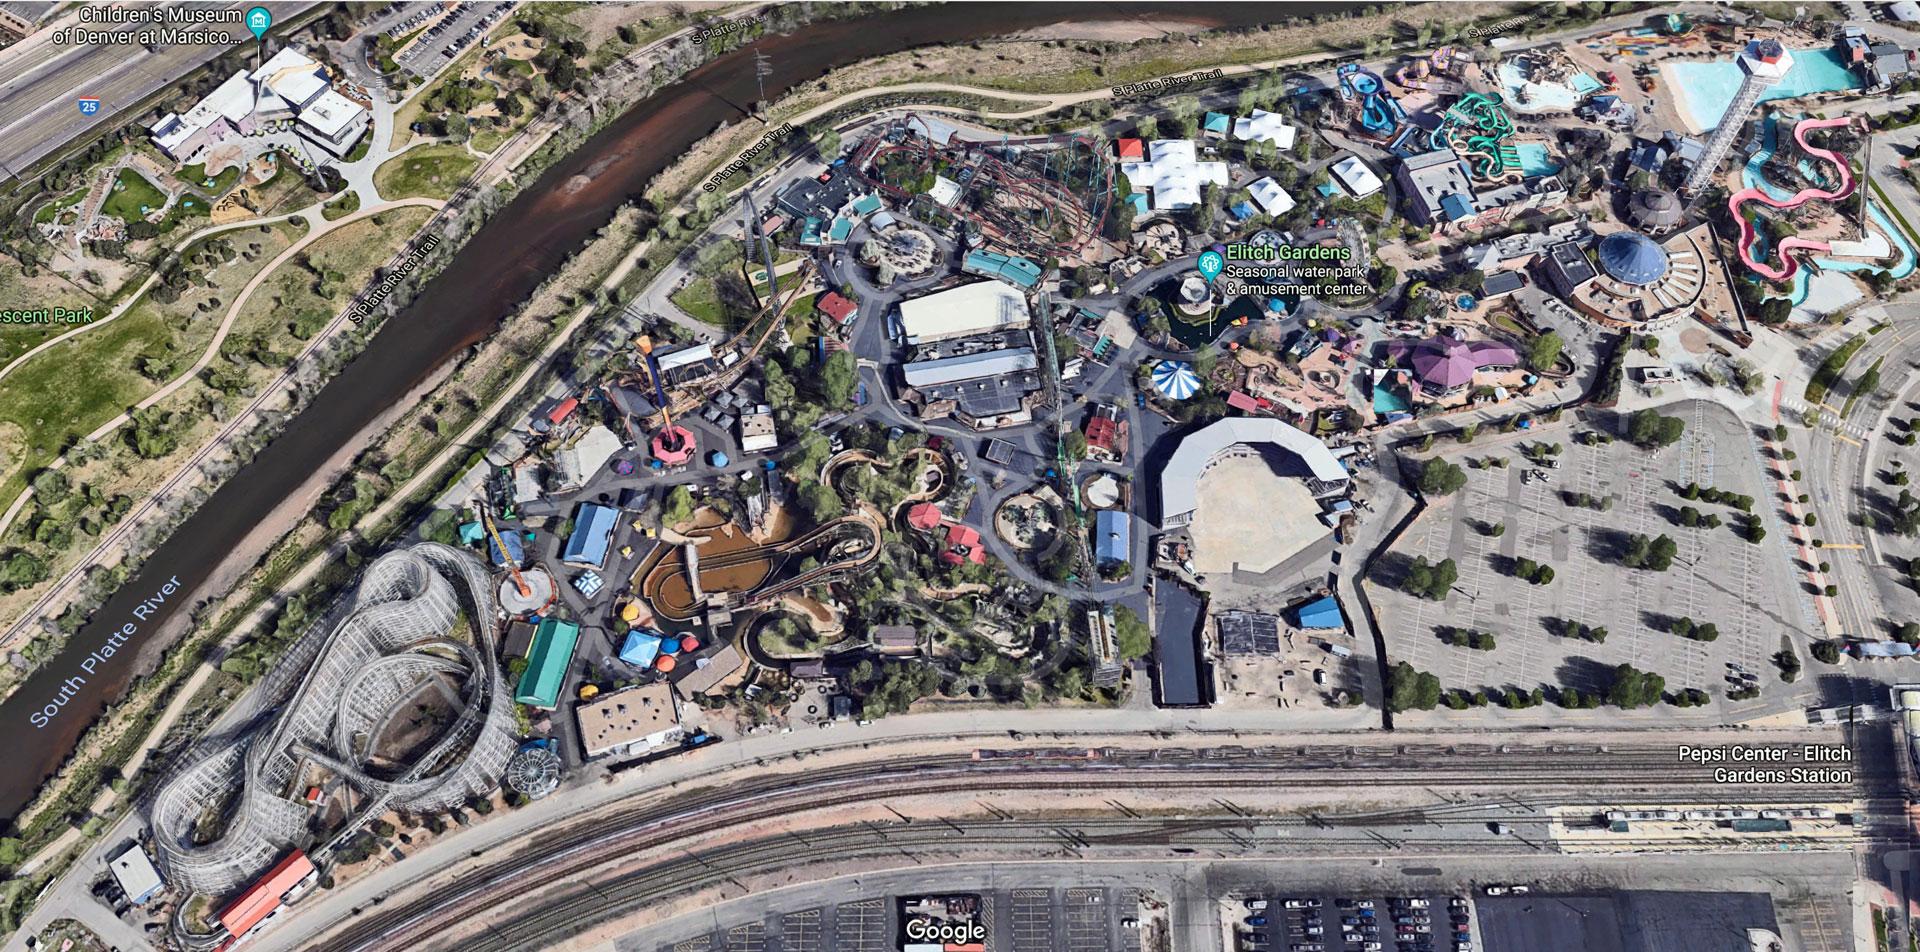 Elitch Gardens Parking For Pepsi Center